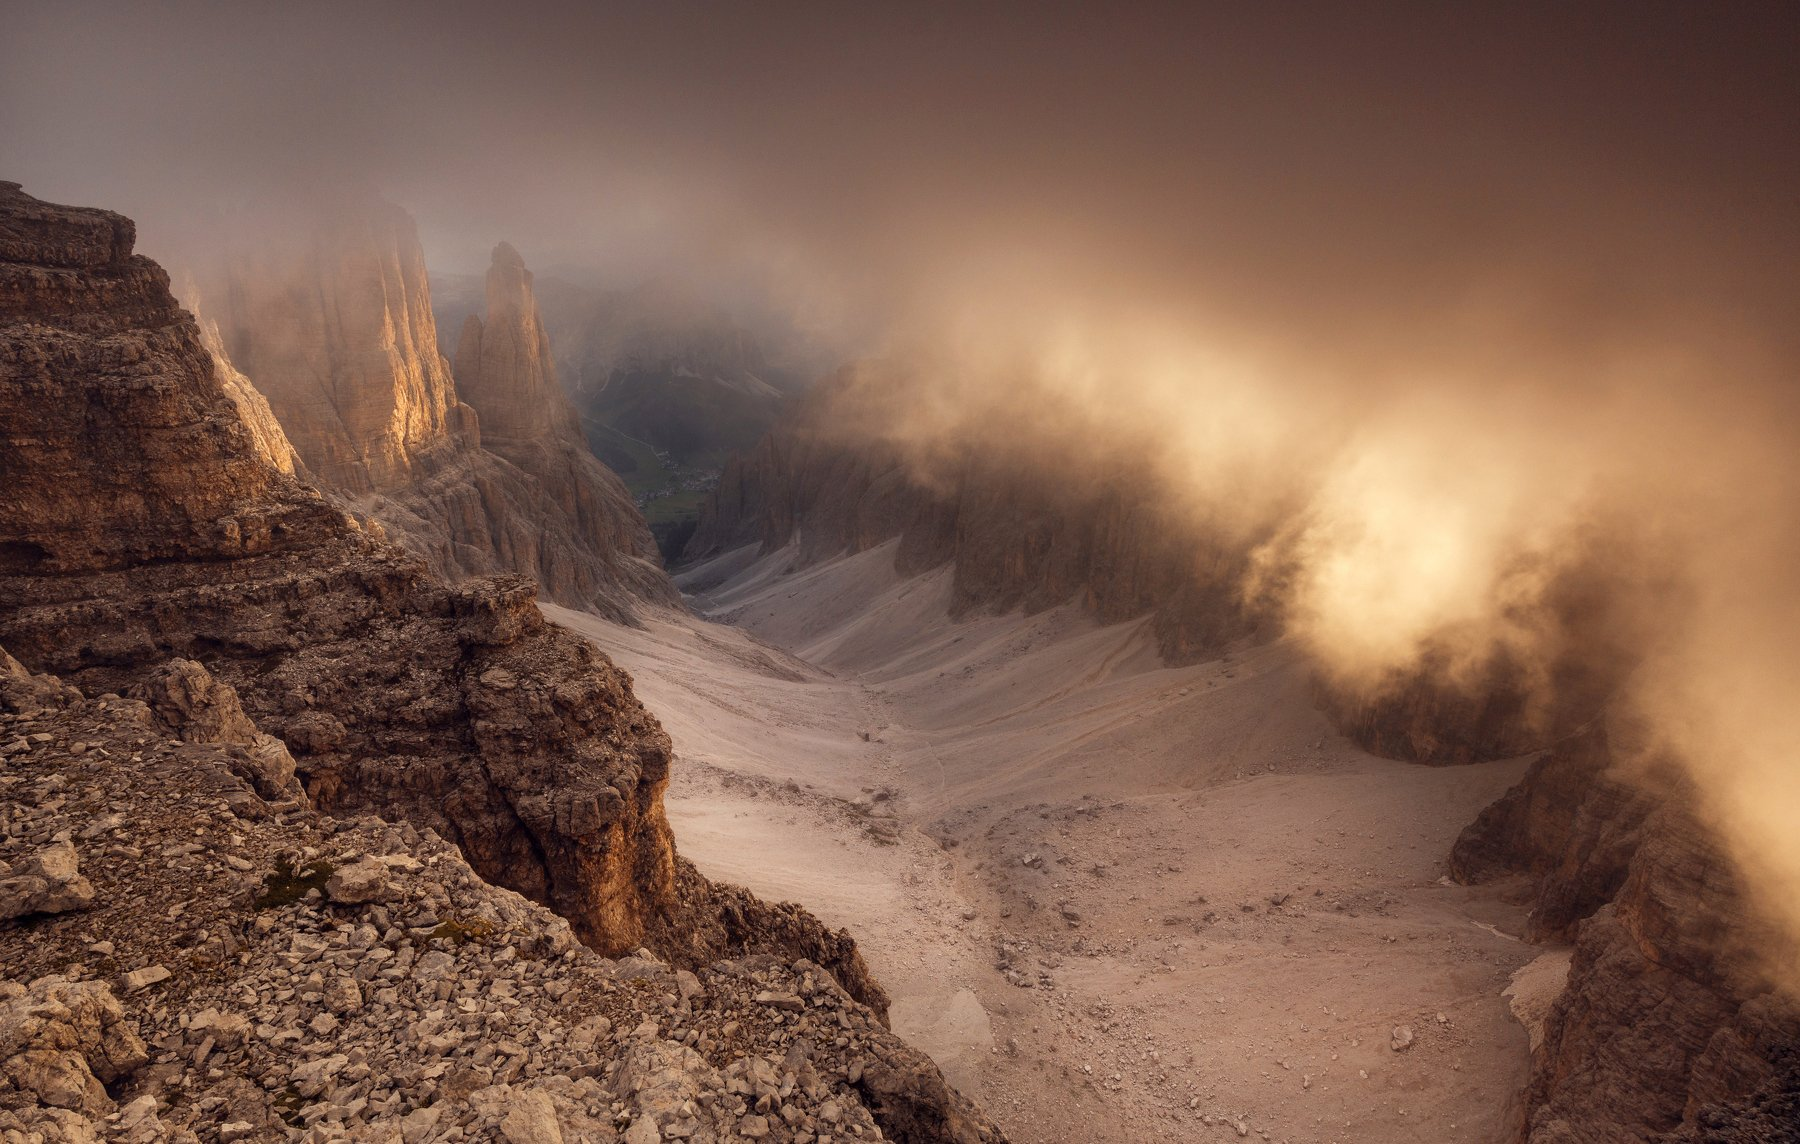 mountains, dolomites, italy, sunrise, landscape, nature, travel, summer, peak, clouds, Lazar Ioan Ovidiu